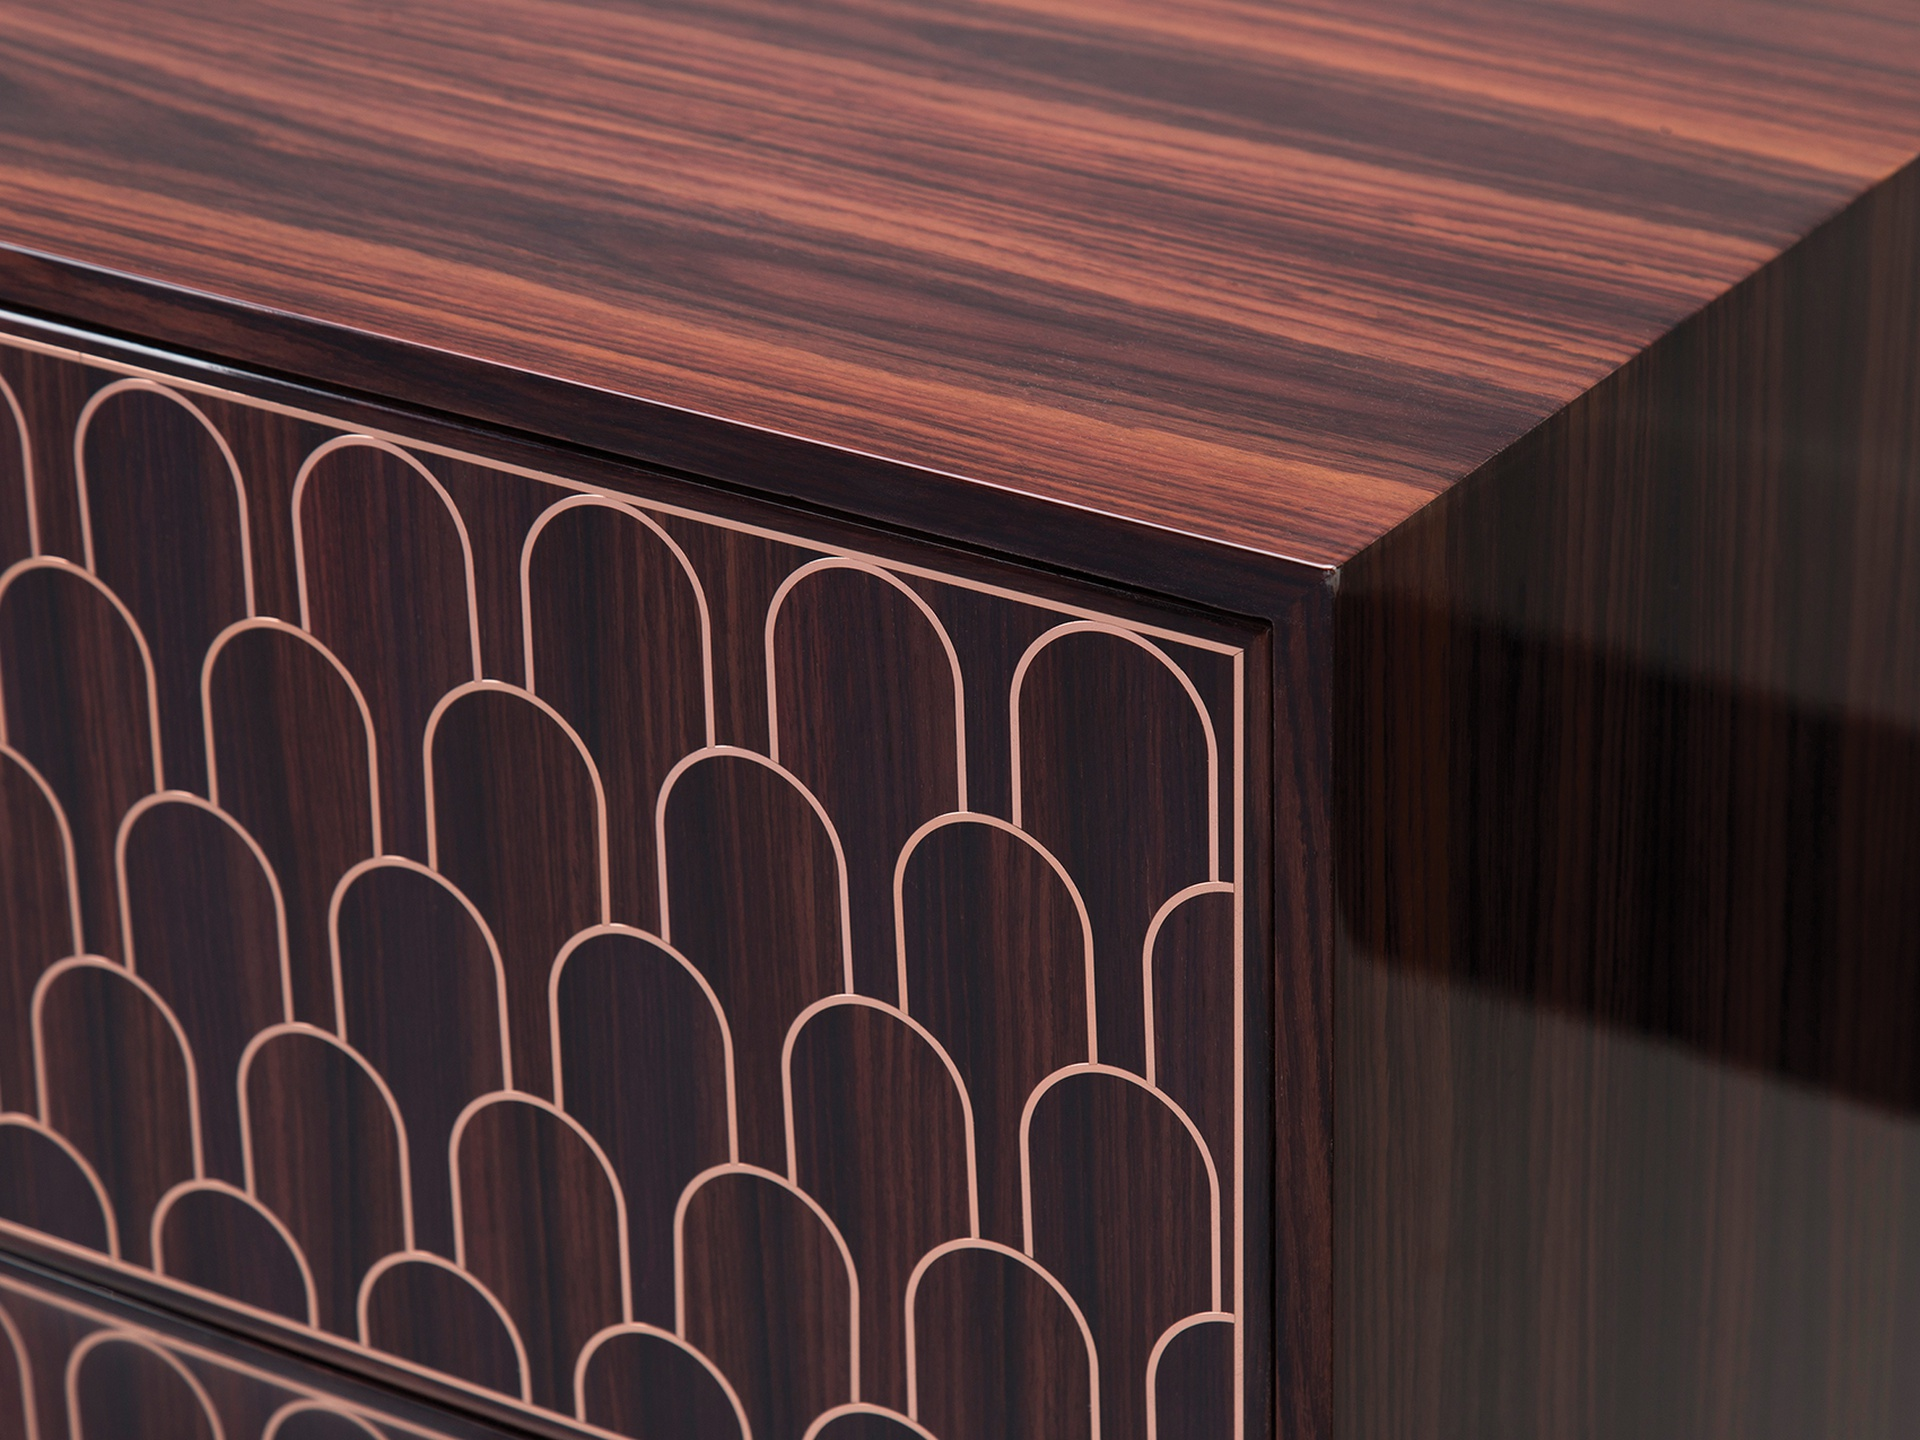 2100-03RW Detail